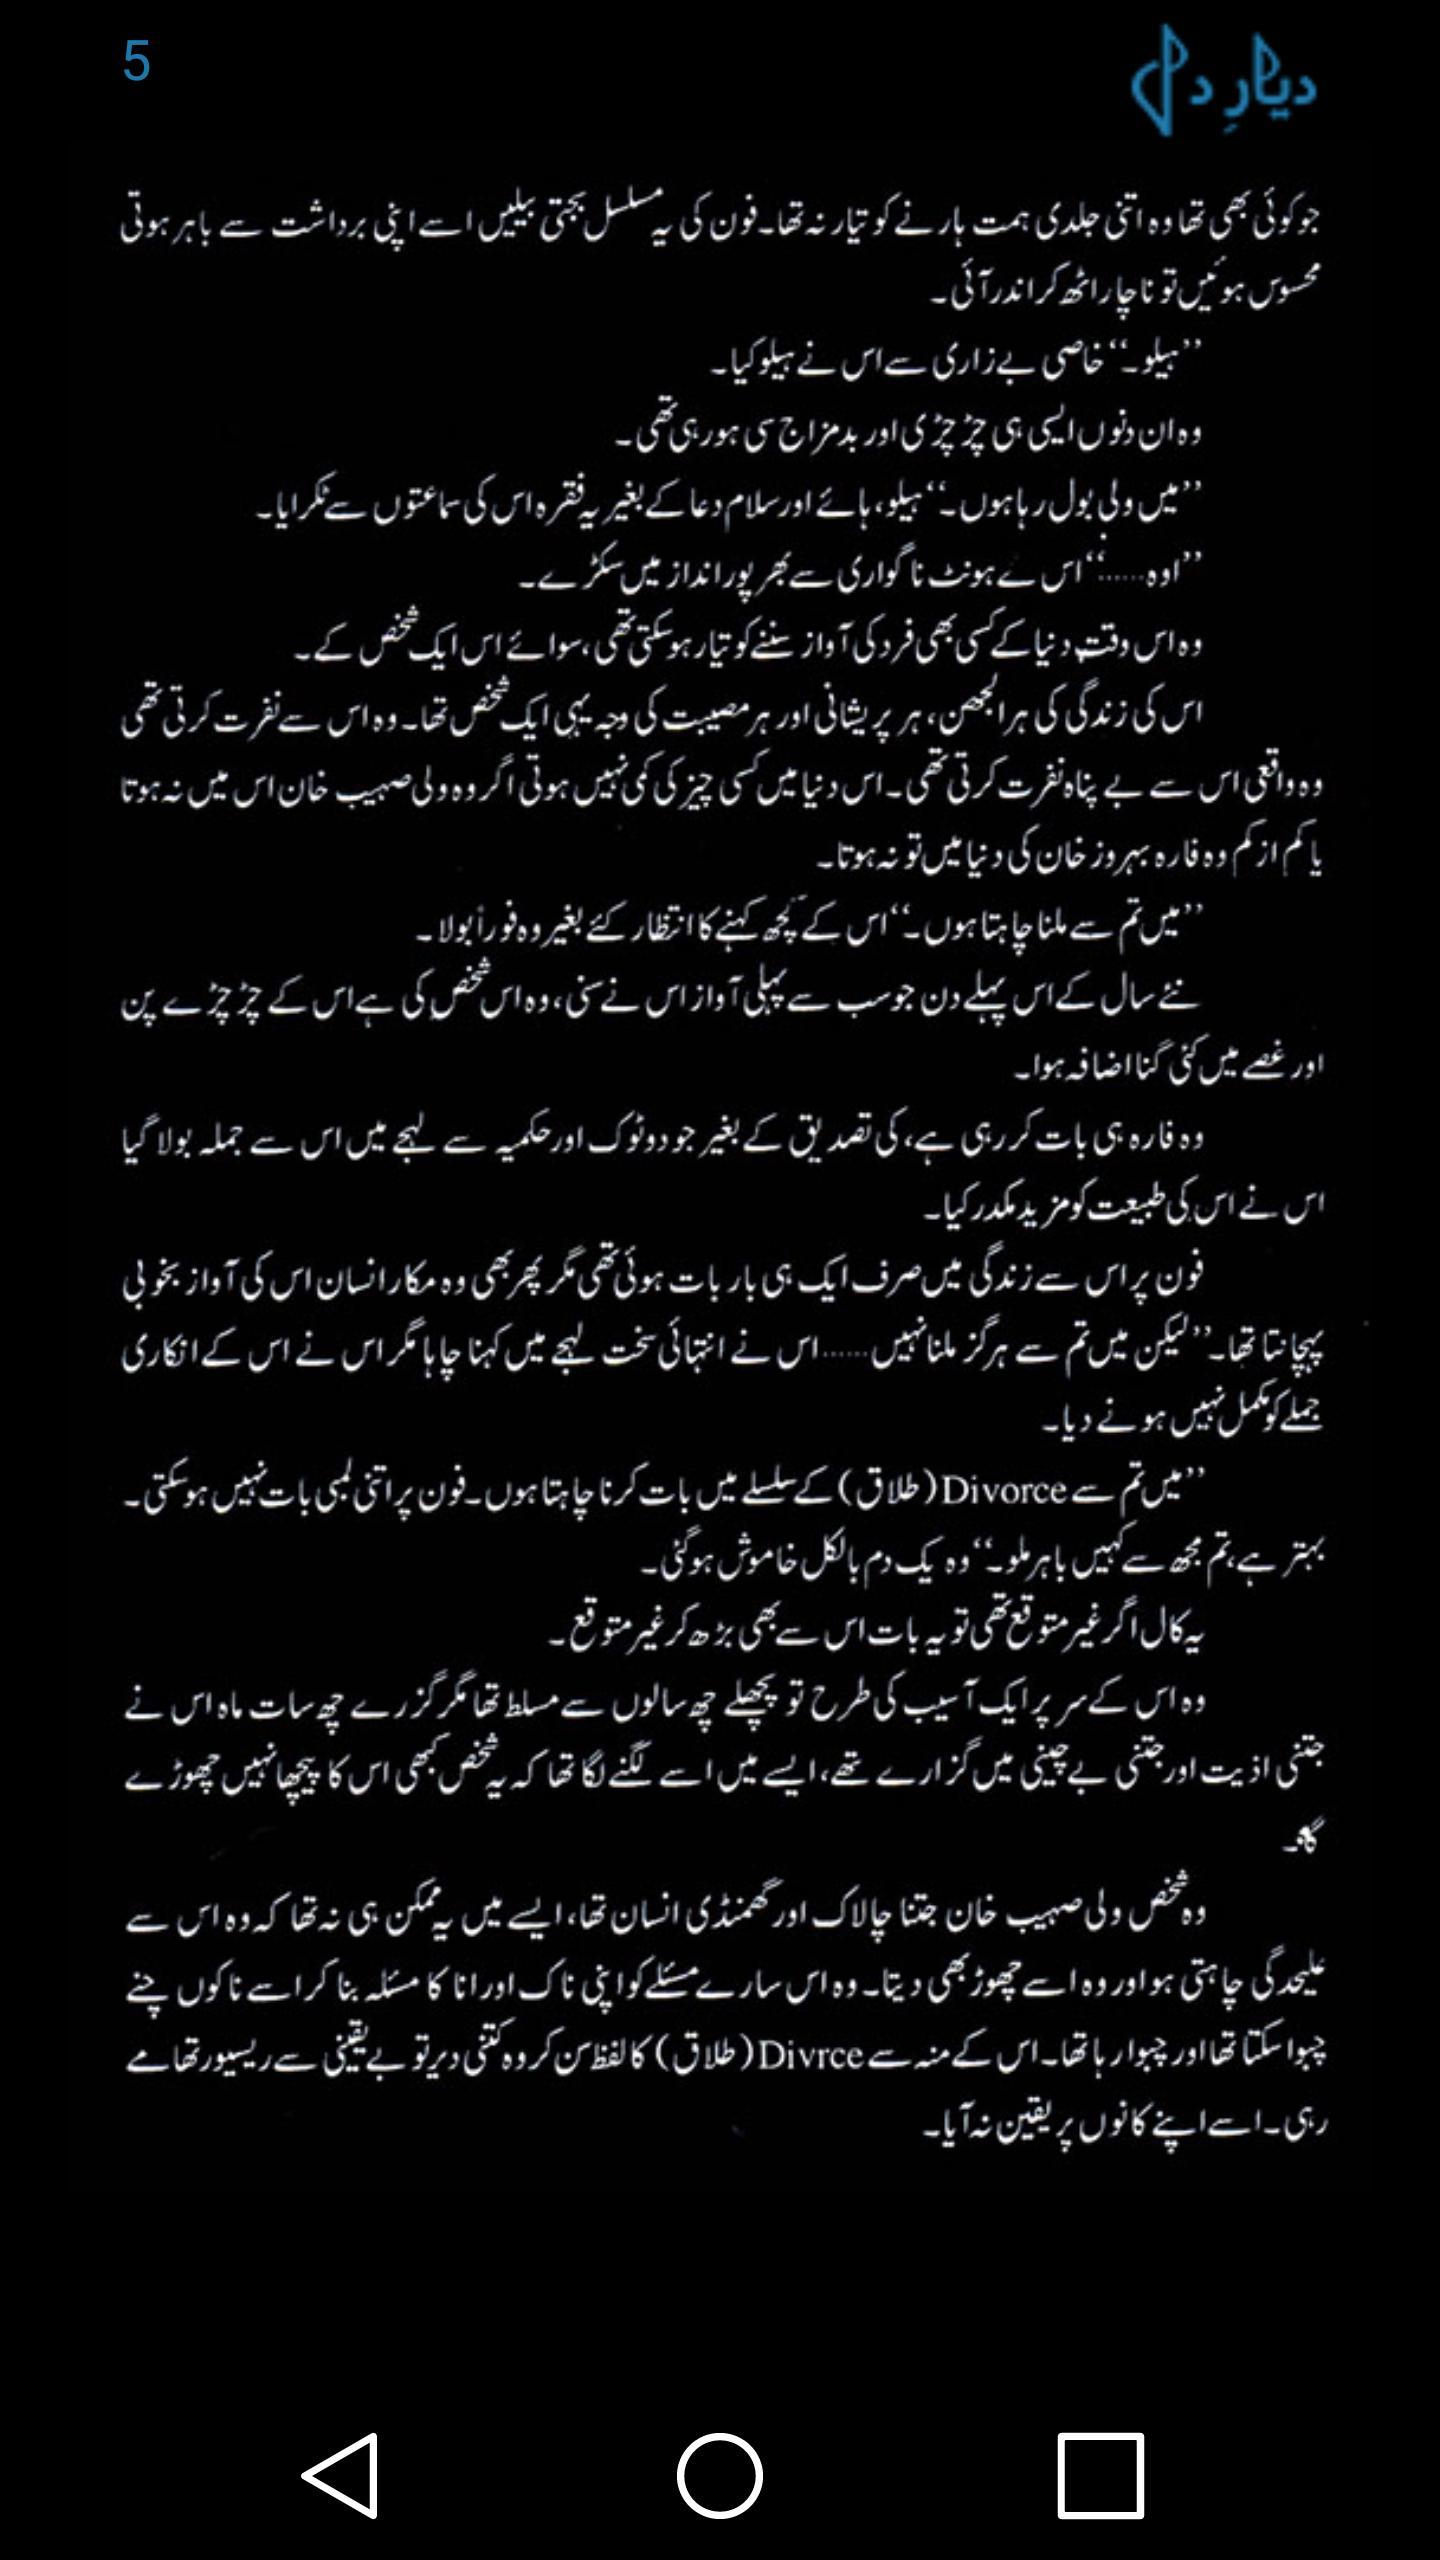 Diyar e Dil Novel Urdu by Farhat Ishtiaq for Android - APK Download